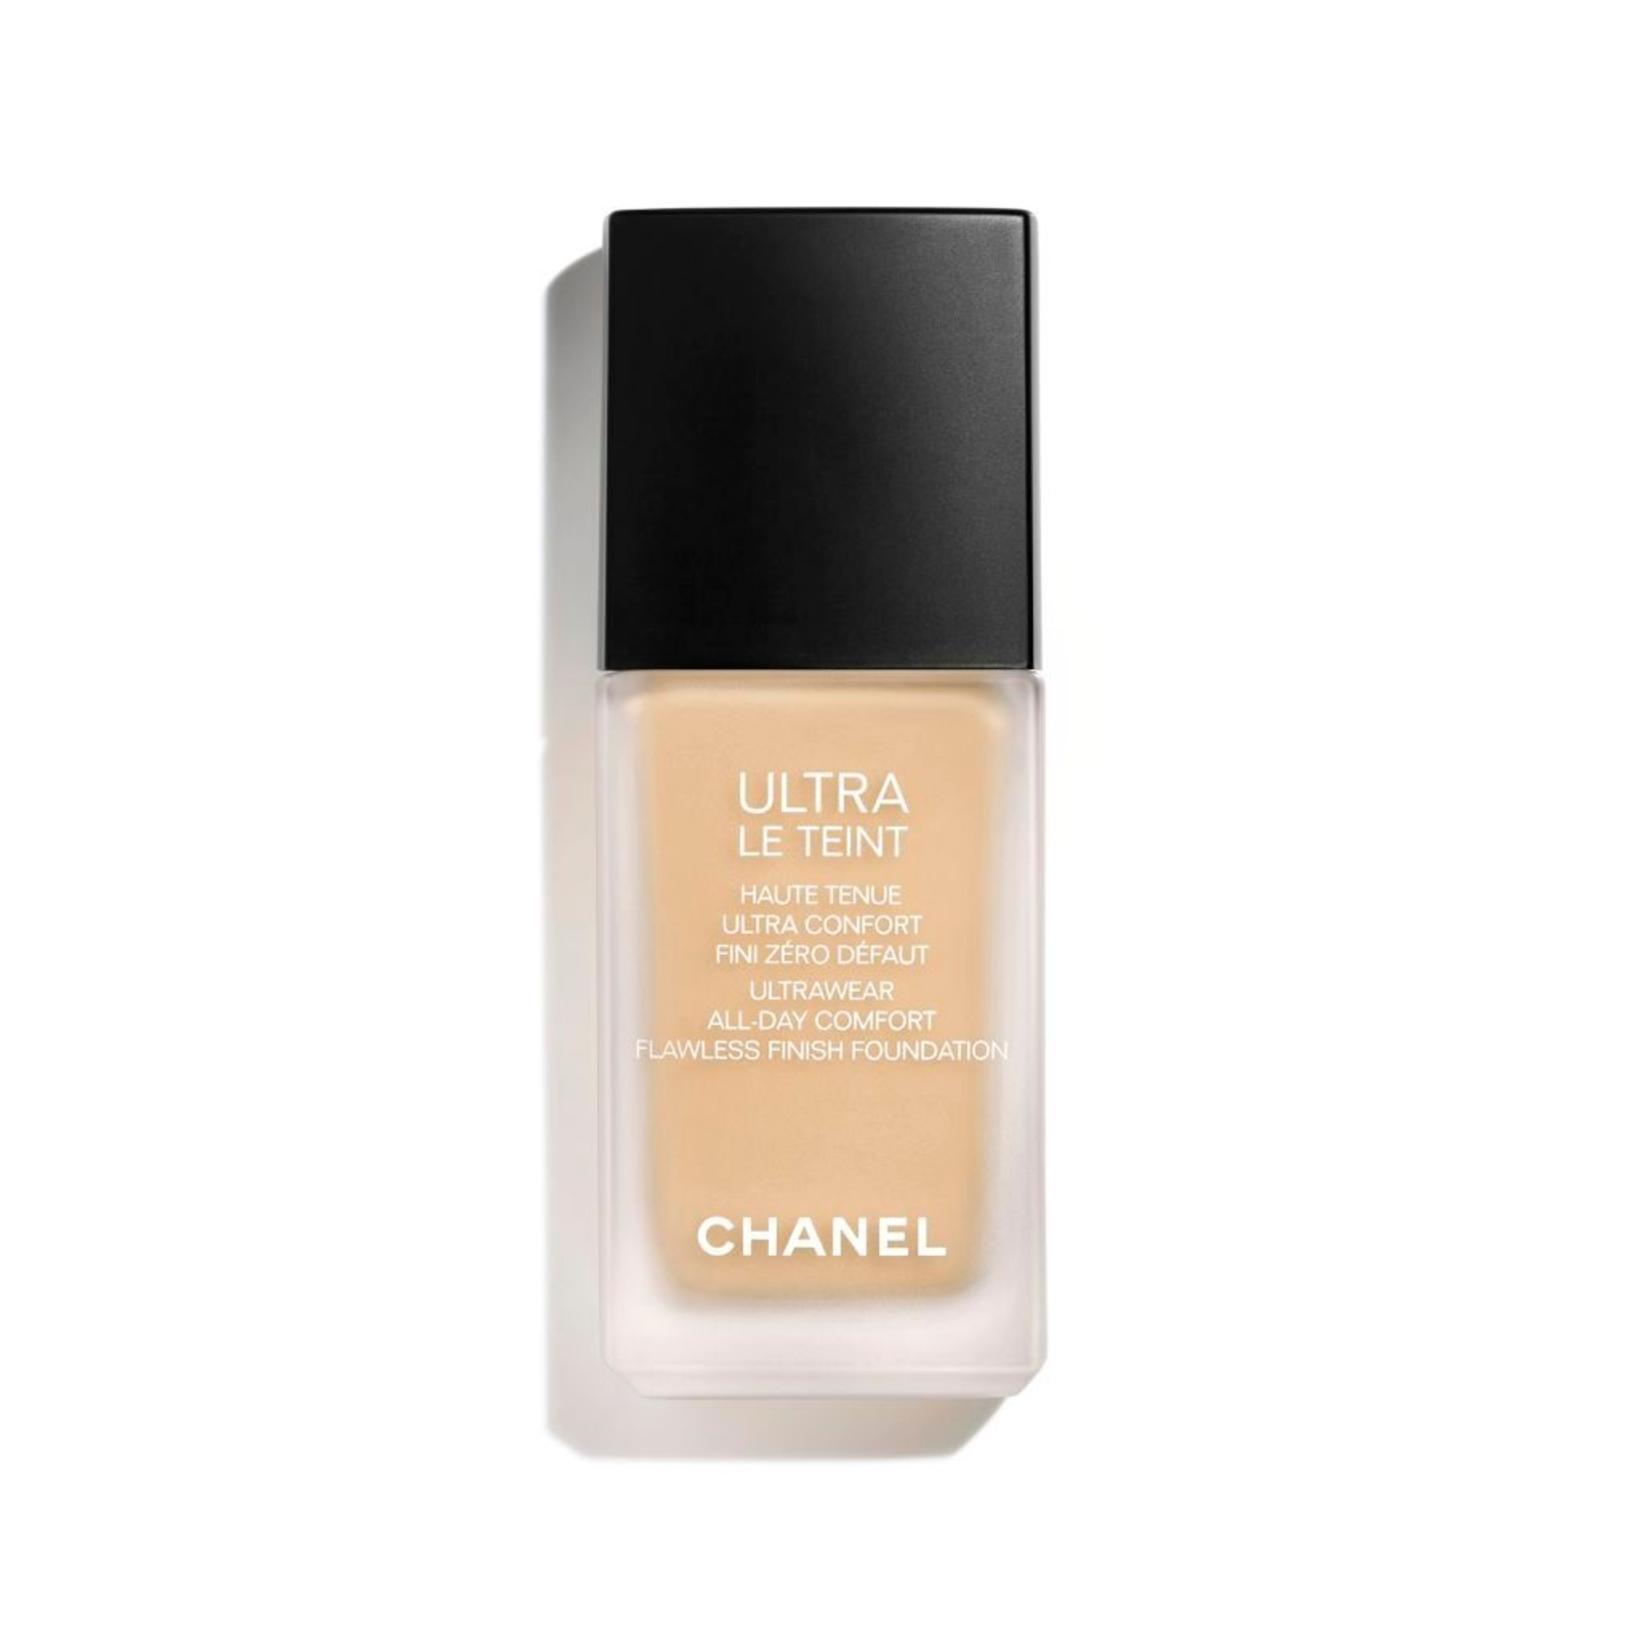 Chanel Ultra Le Teint.